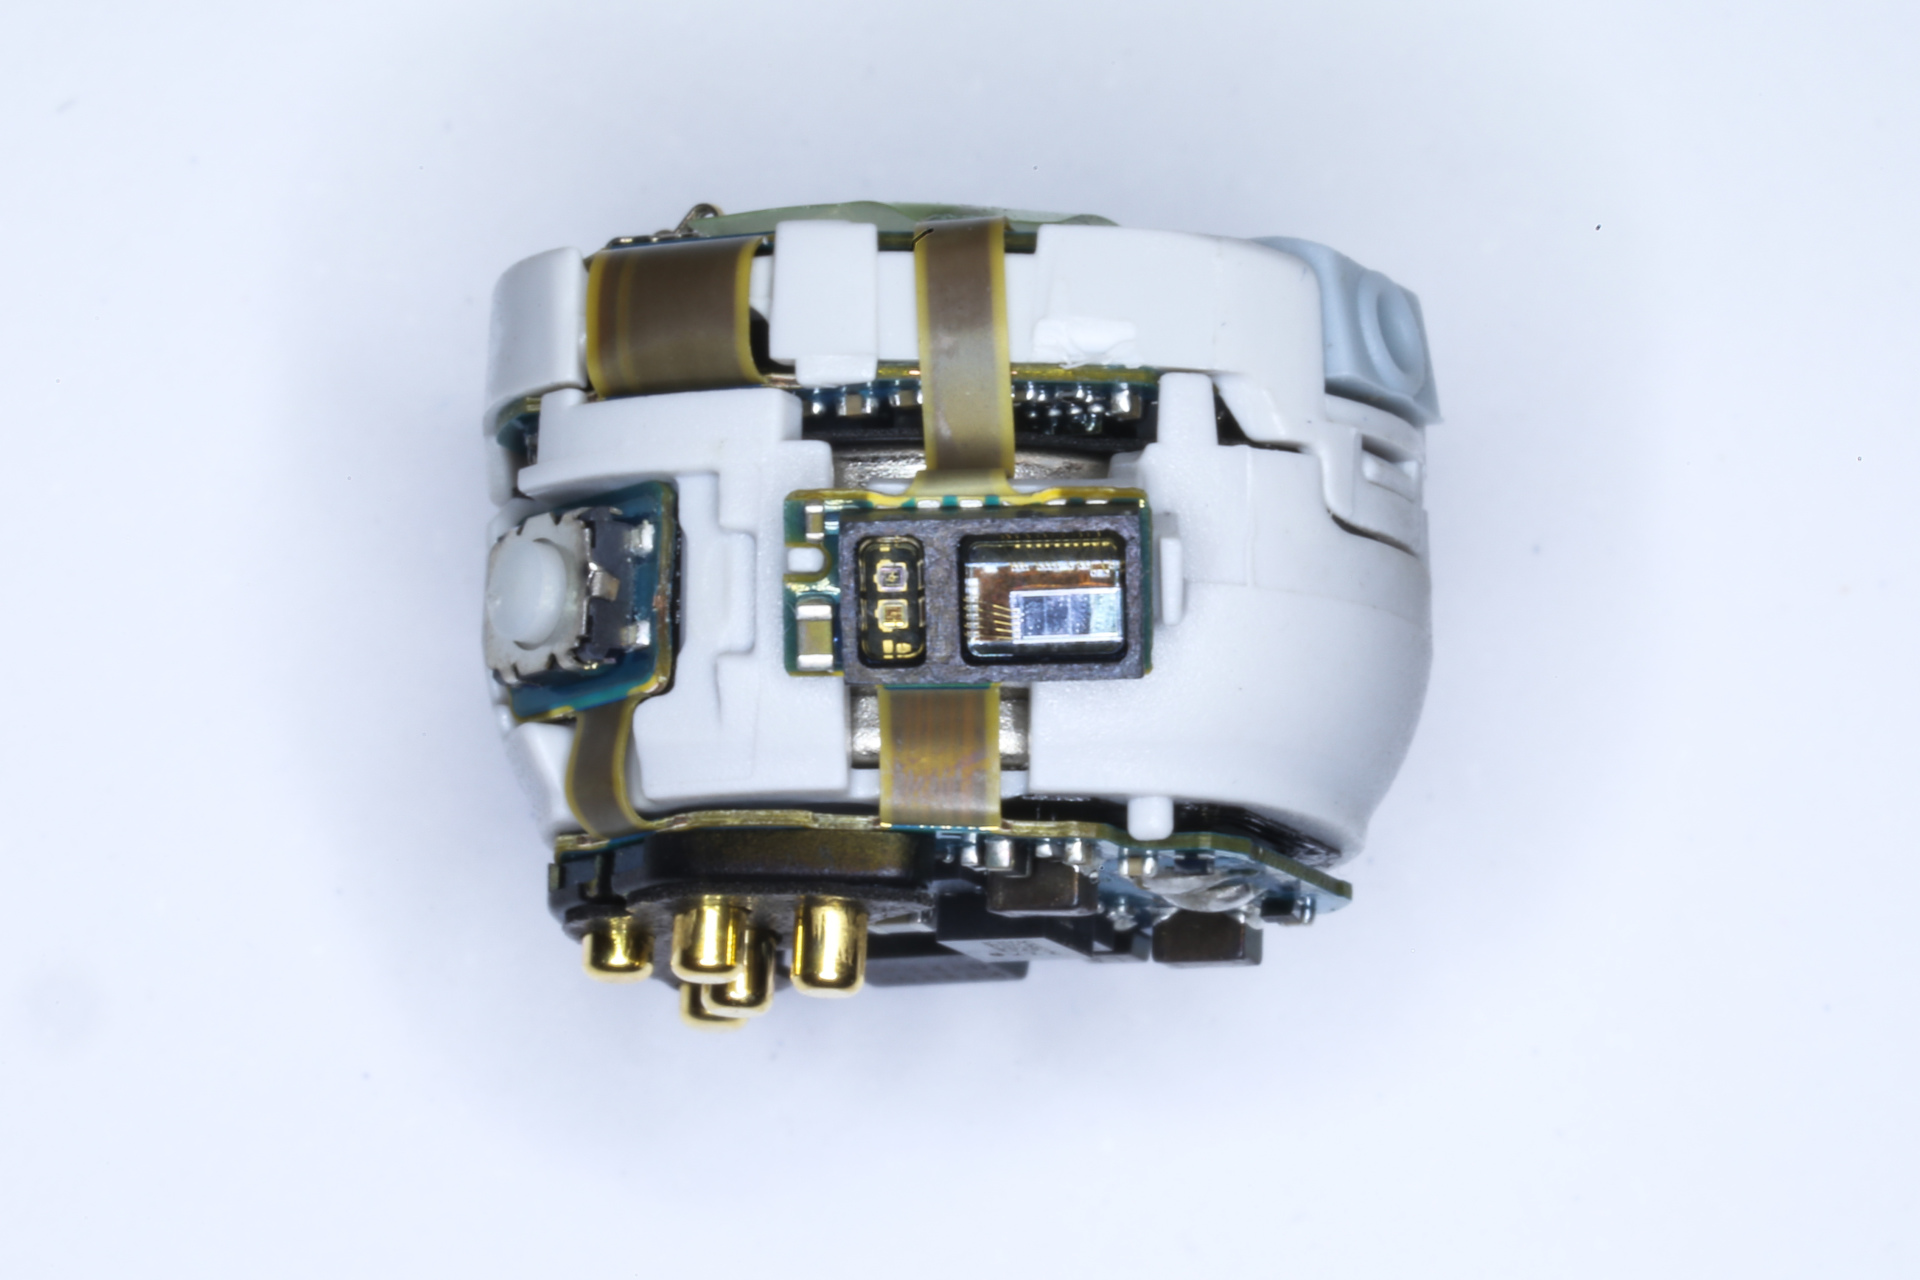 IconX circuit module